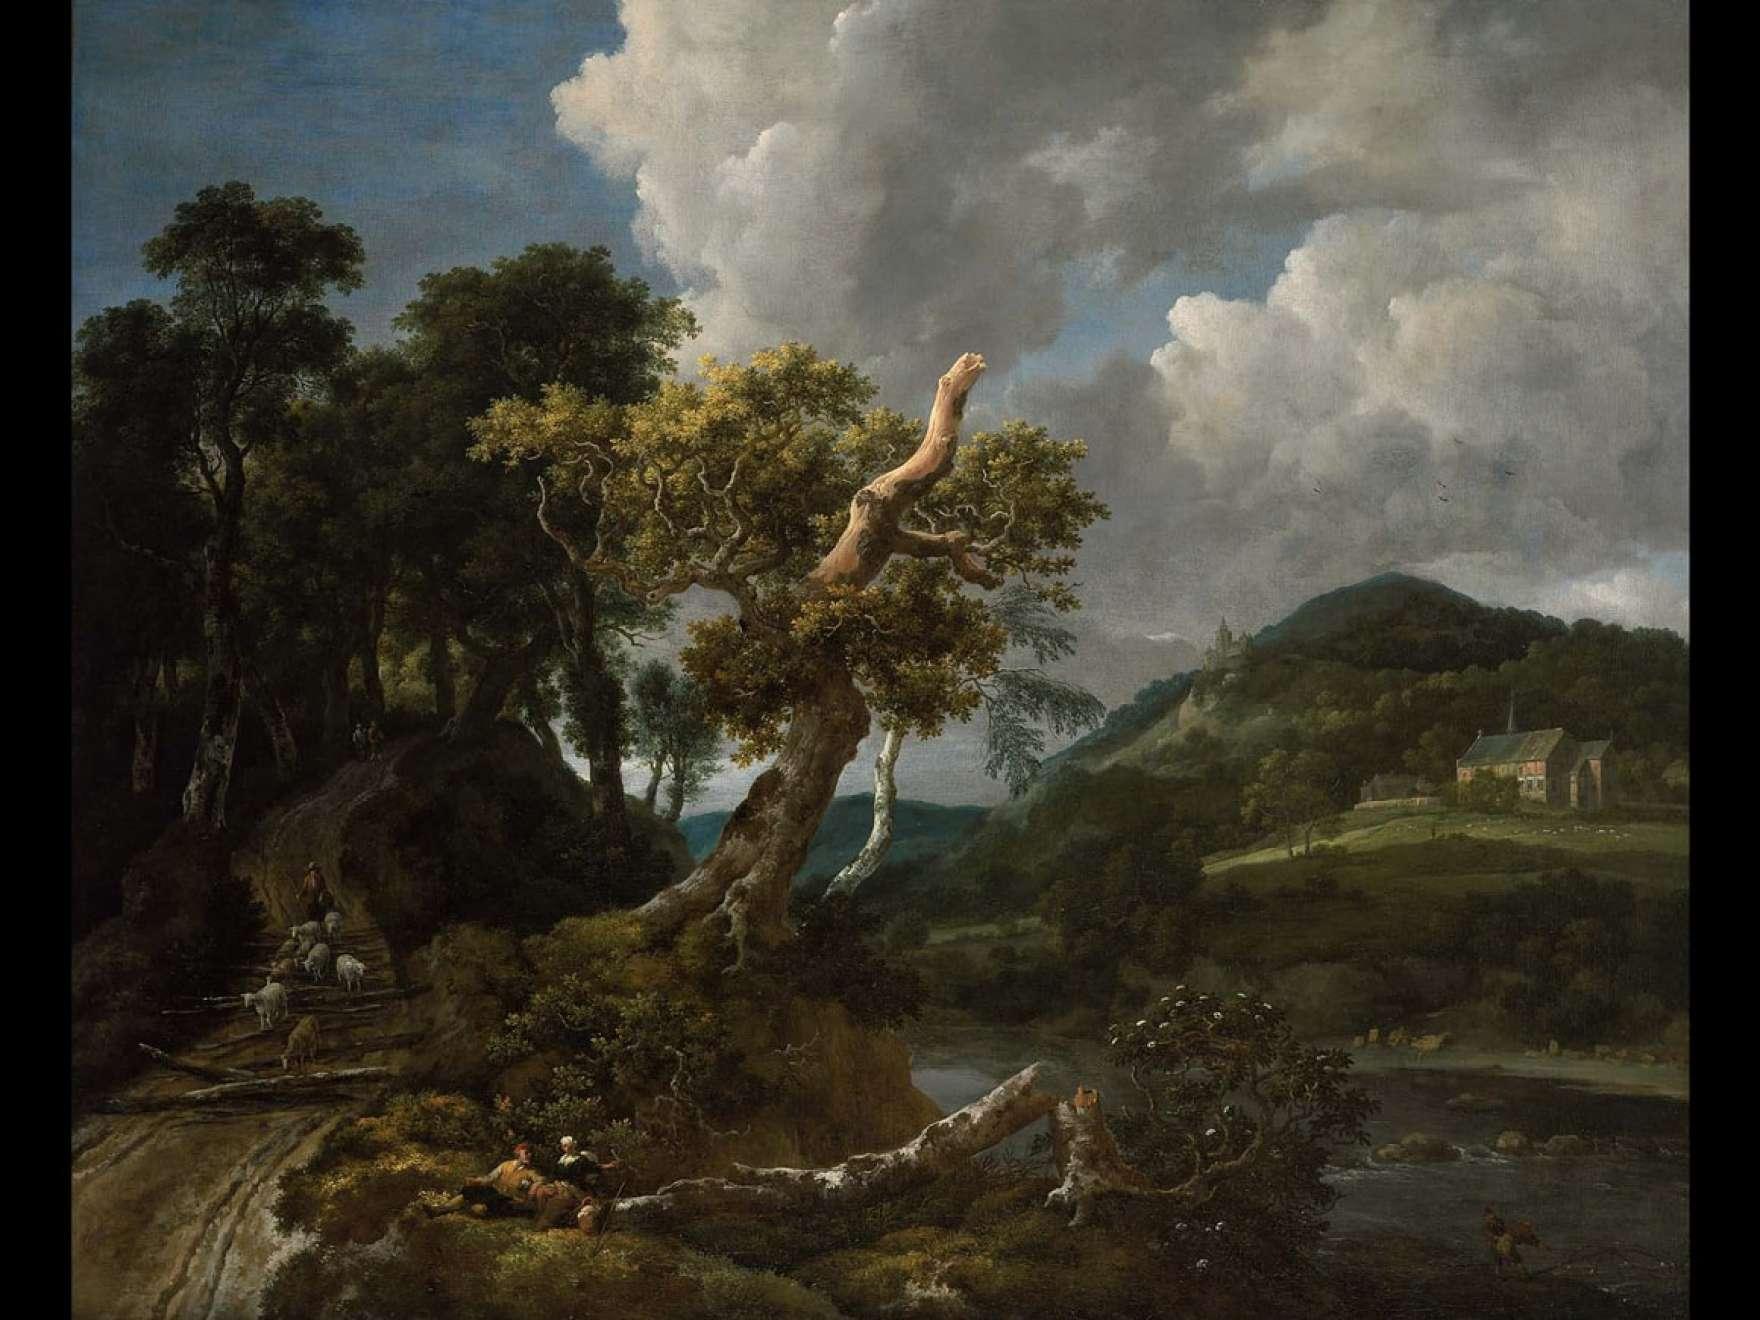 Jacob Isaacksz. van Ruisdael's painting, Wooded River Landscape with Shepherd